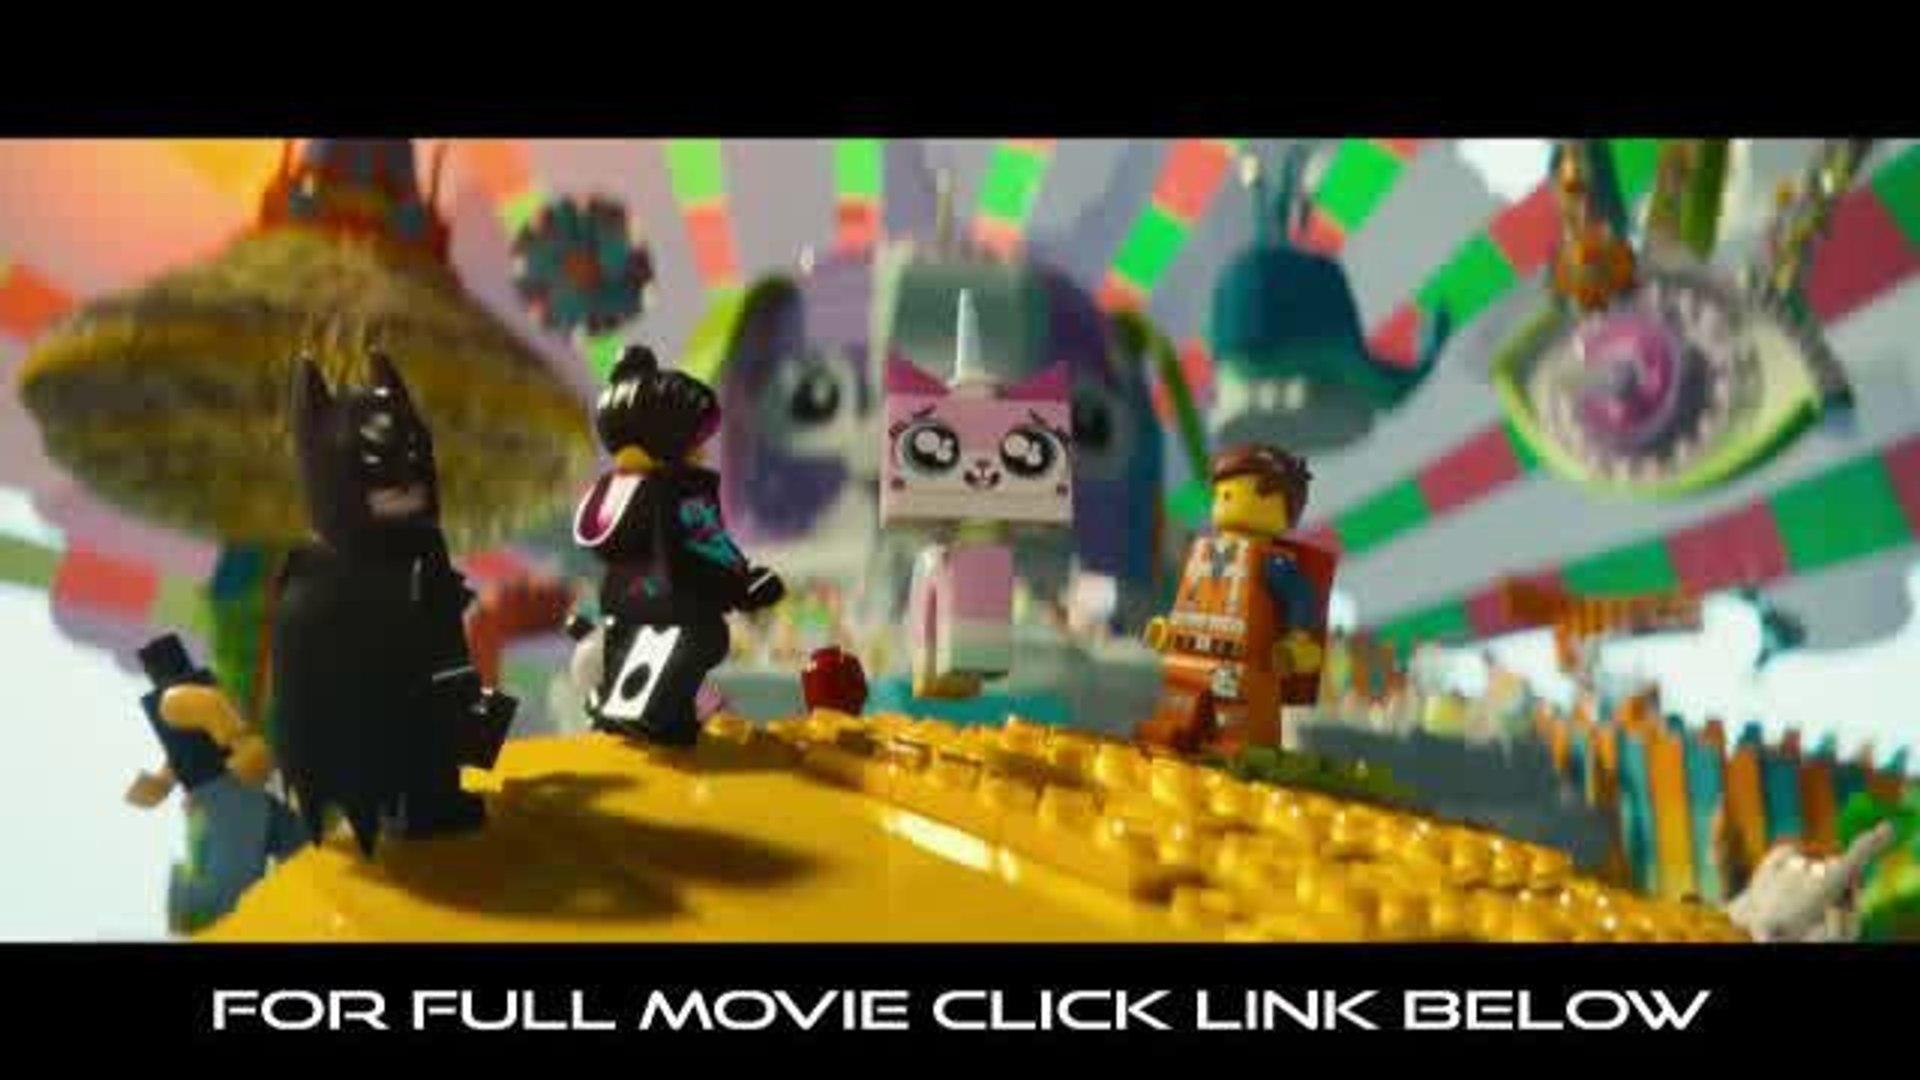 Watch Free Lego Movies: - Lego movies - Free Movies Online